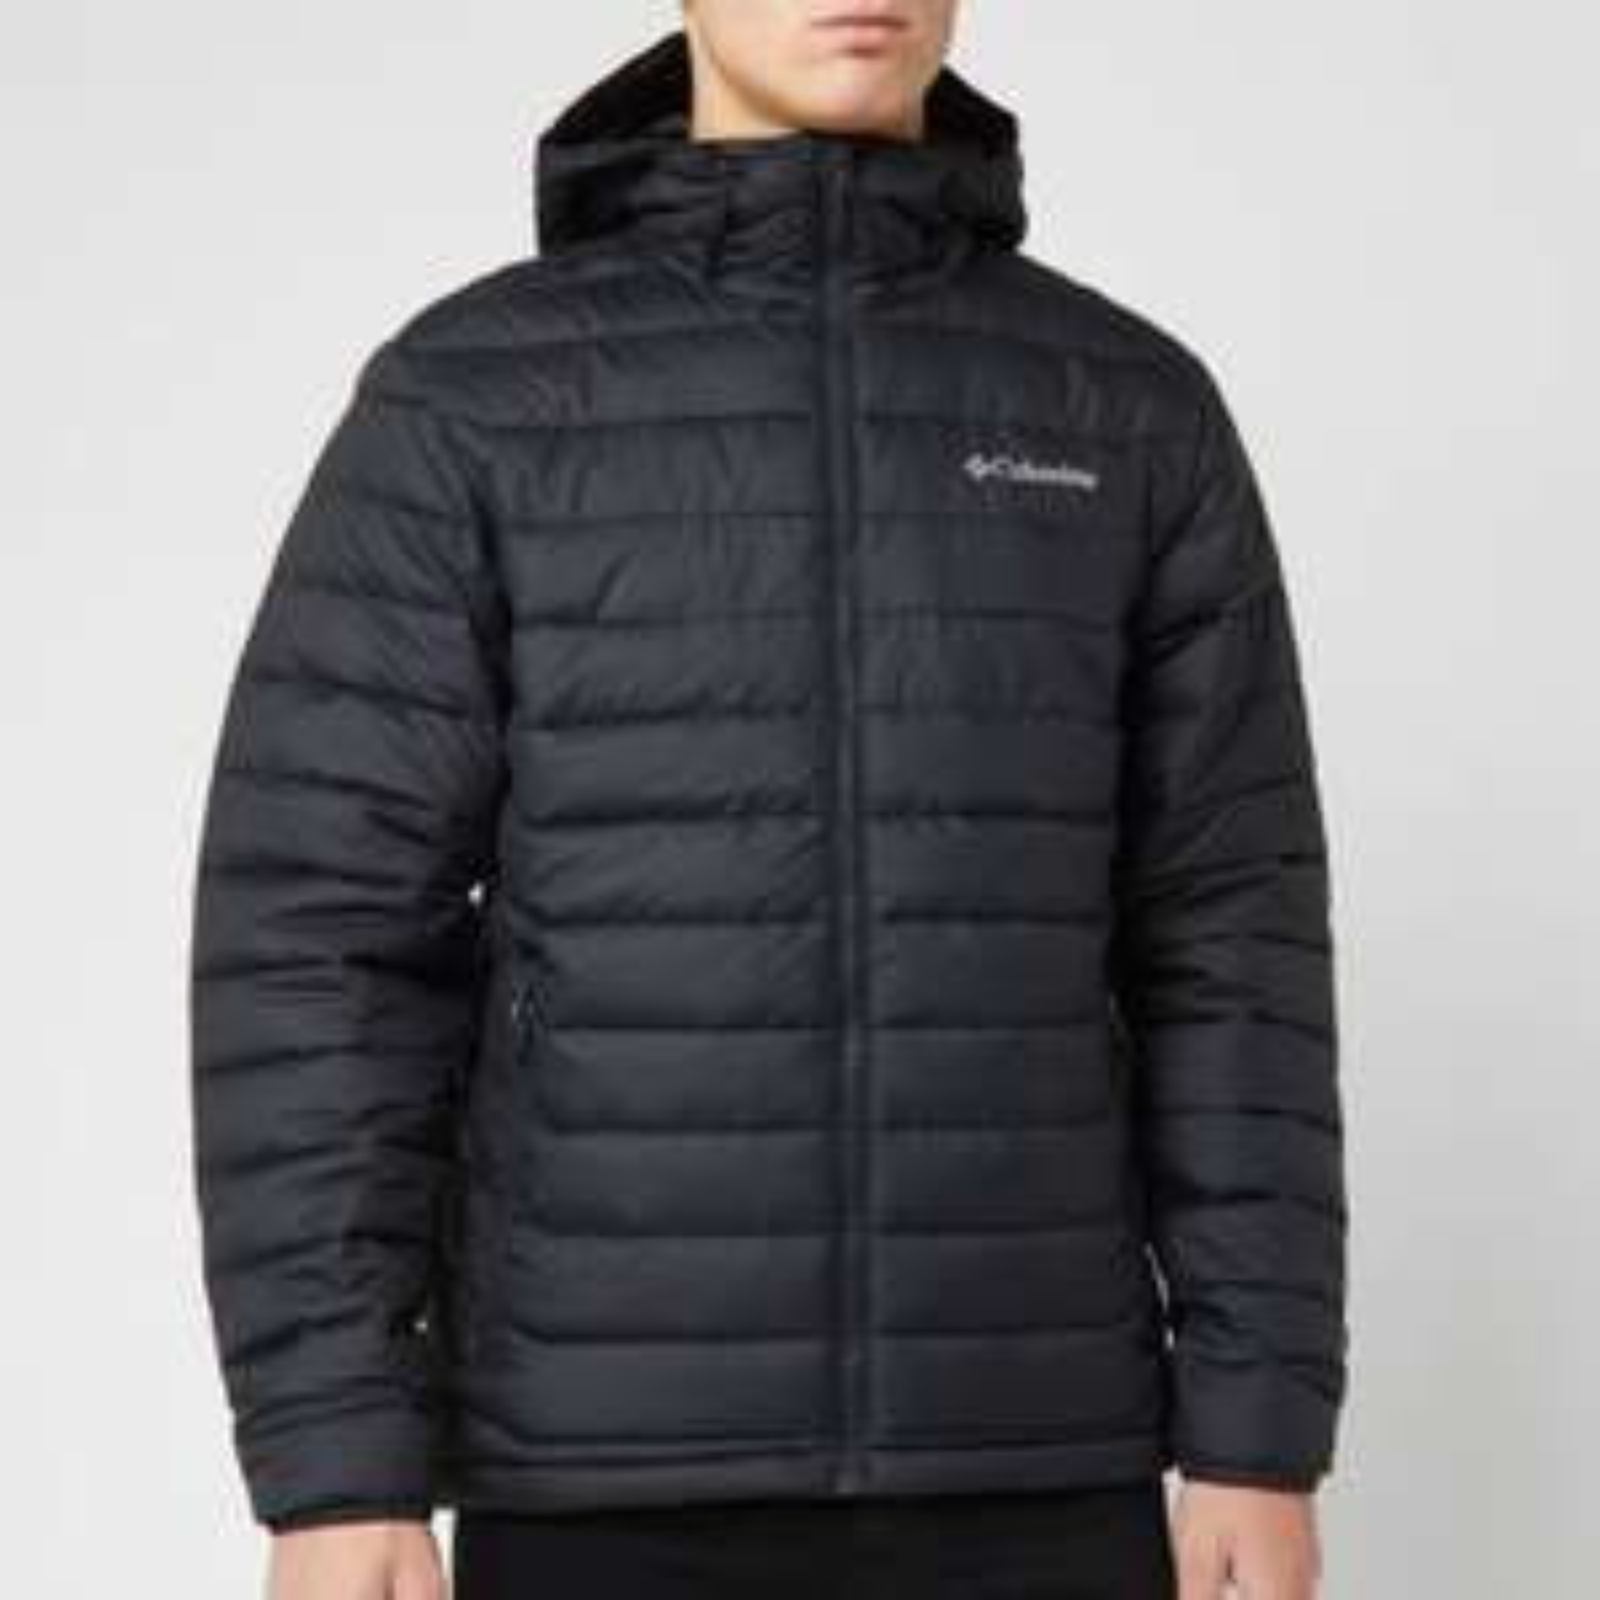 Columbia Men's Powder Lite Hooded Jacket - Black Size L only